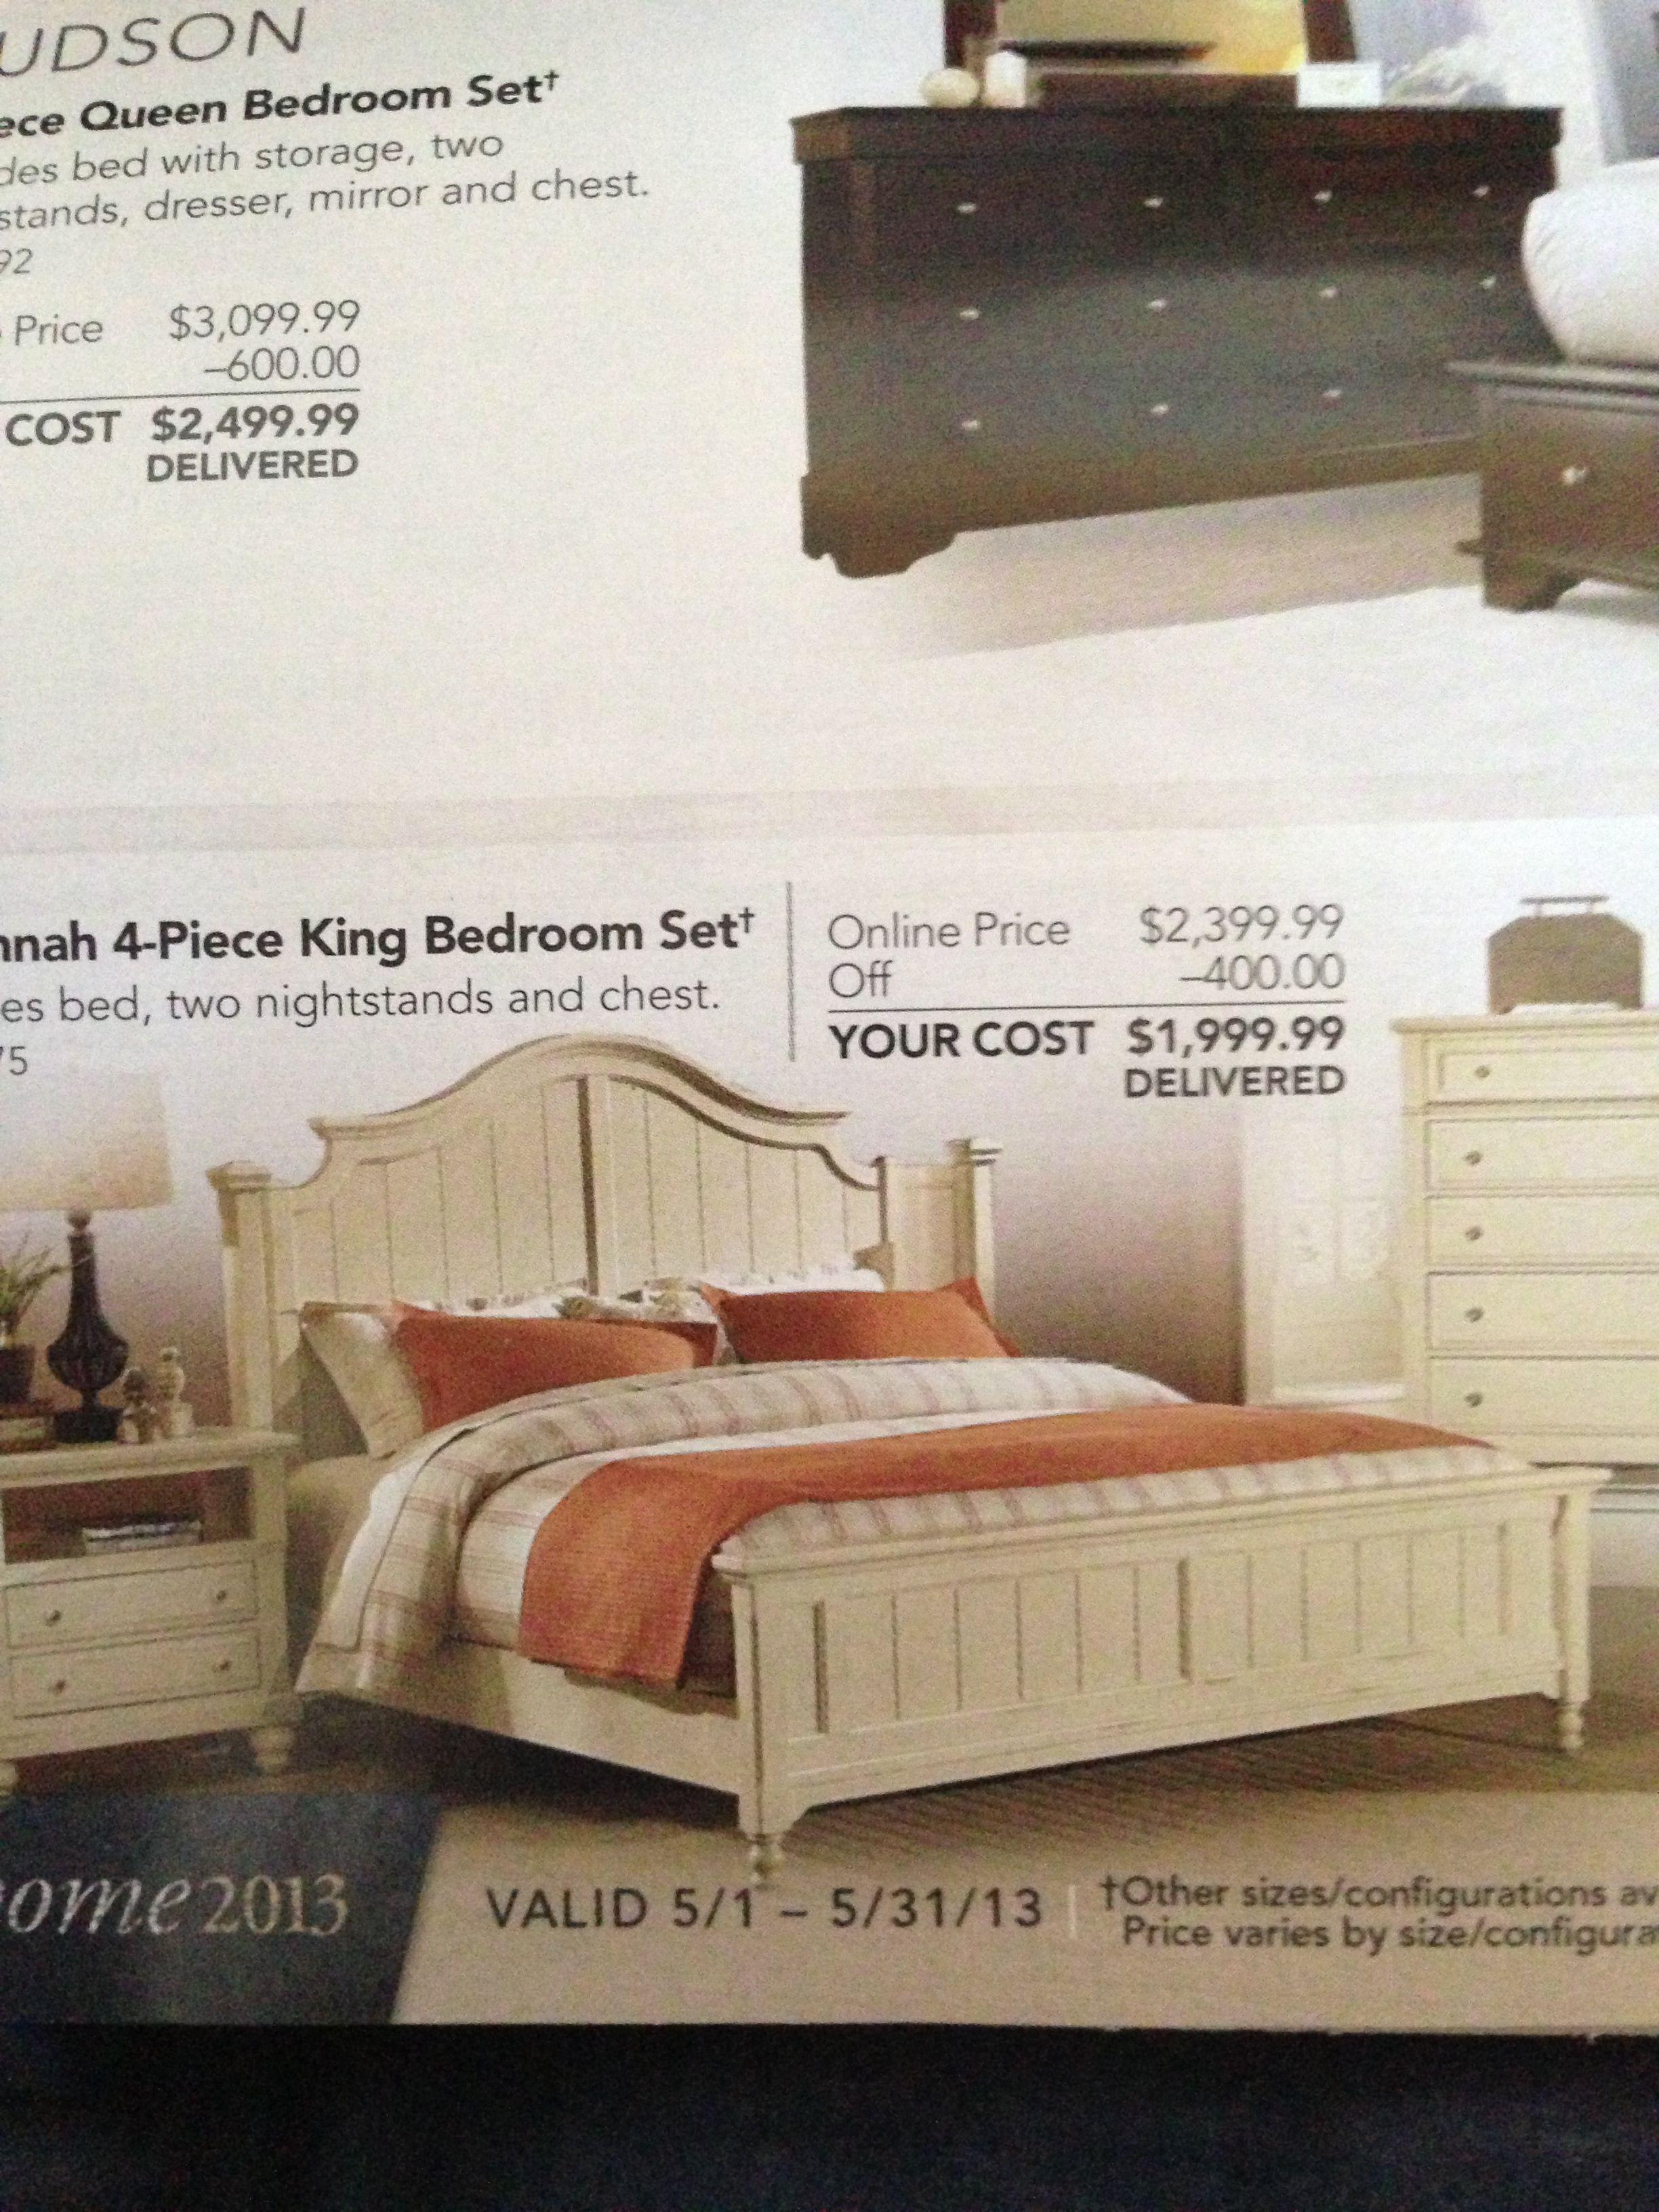 Costco home Costco home, Bed storage, King bedroom